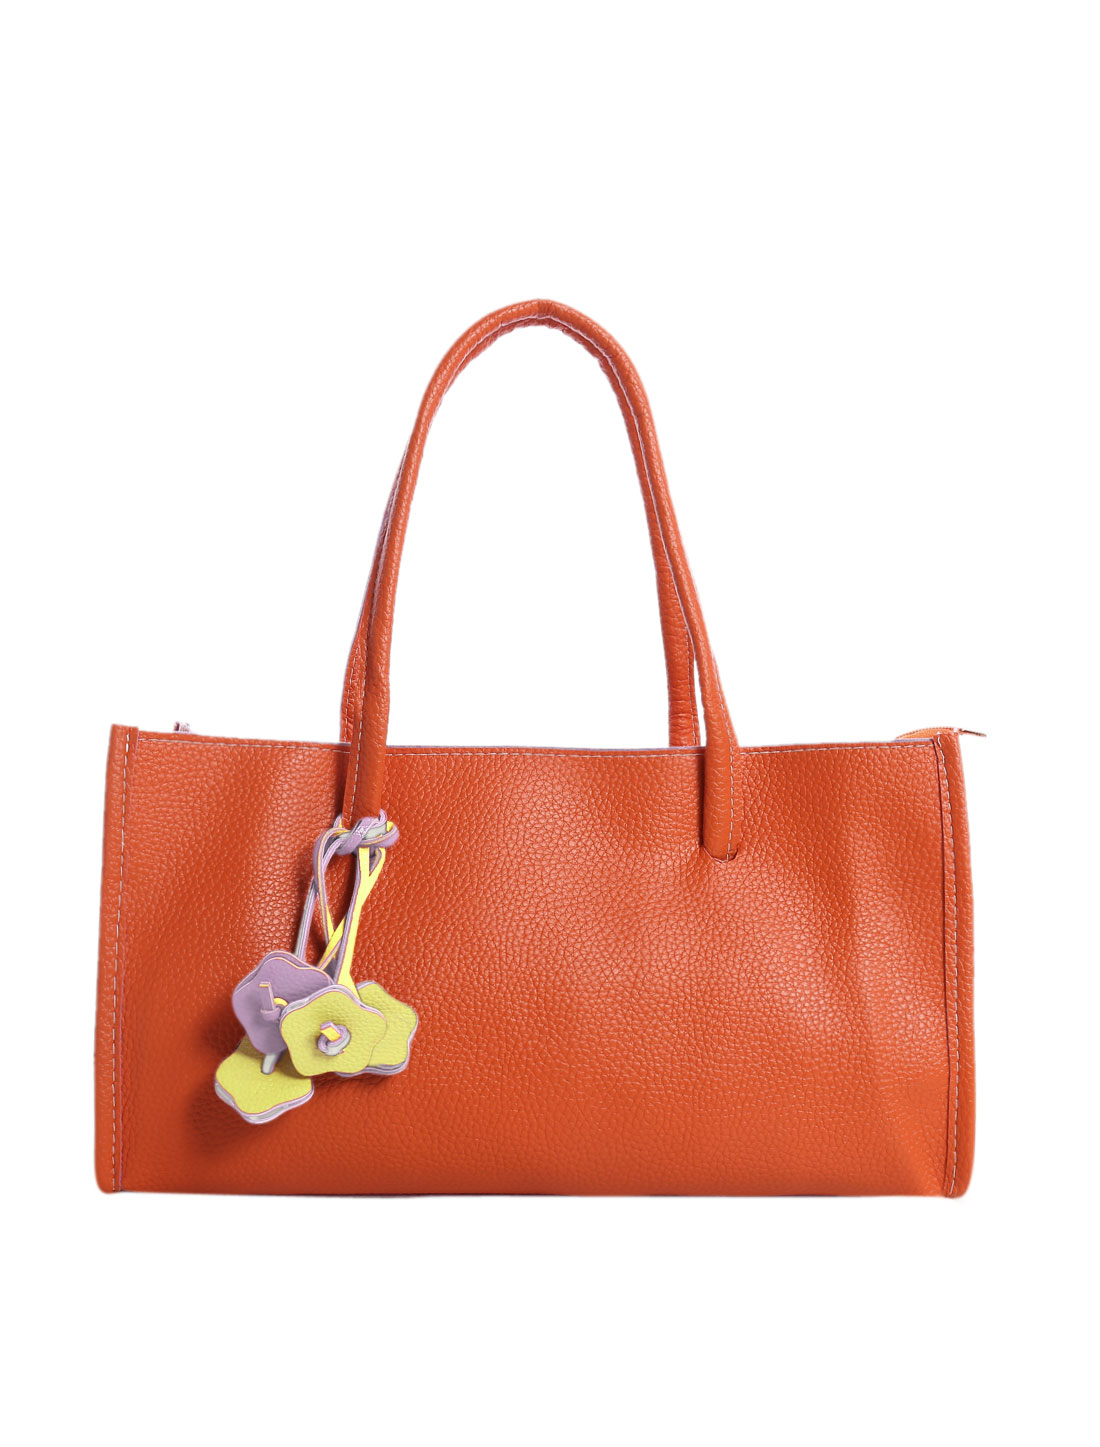 Woman Textured PU Leather Zip Closure Fashion Box Satchel Orange